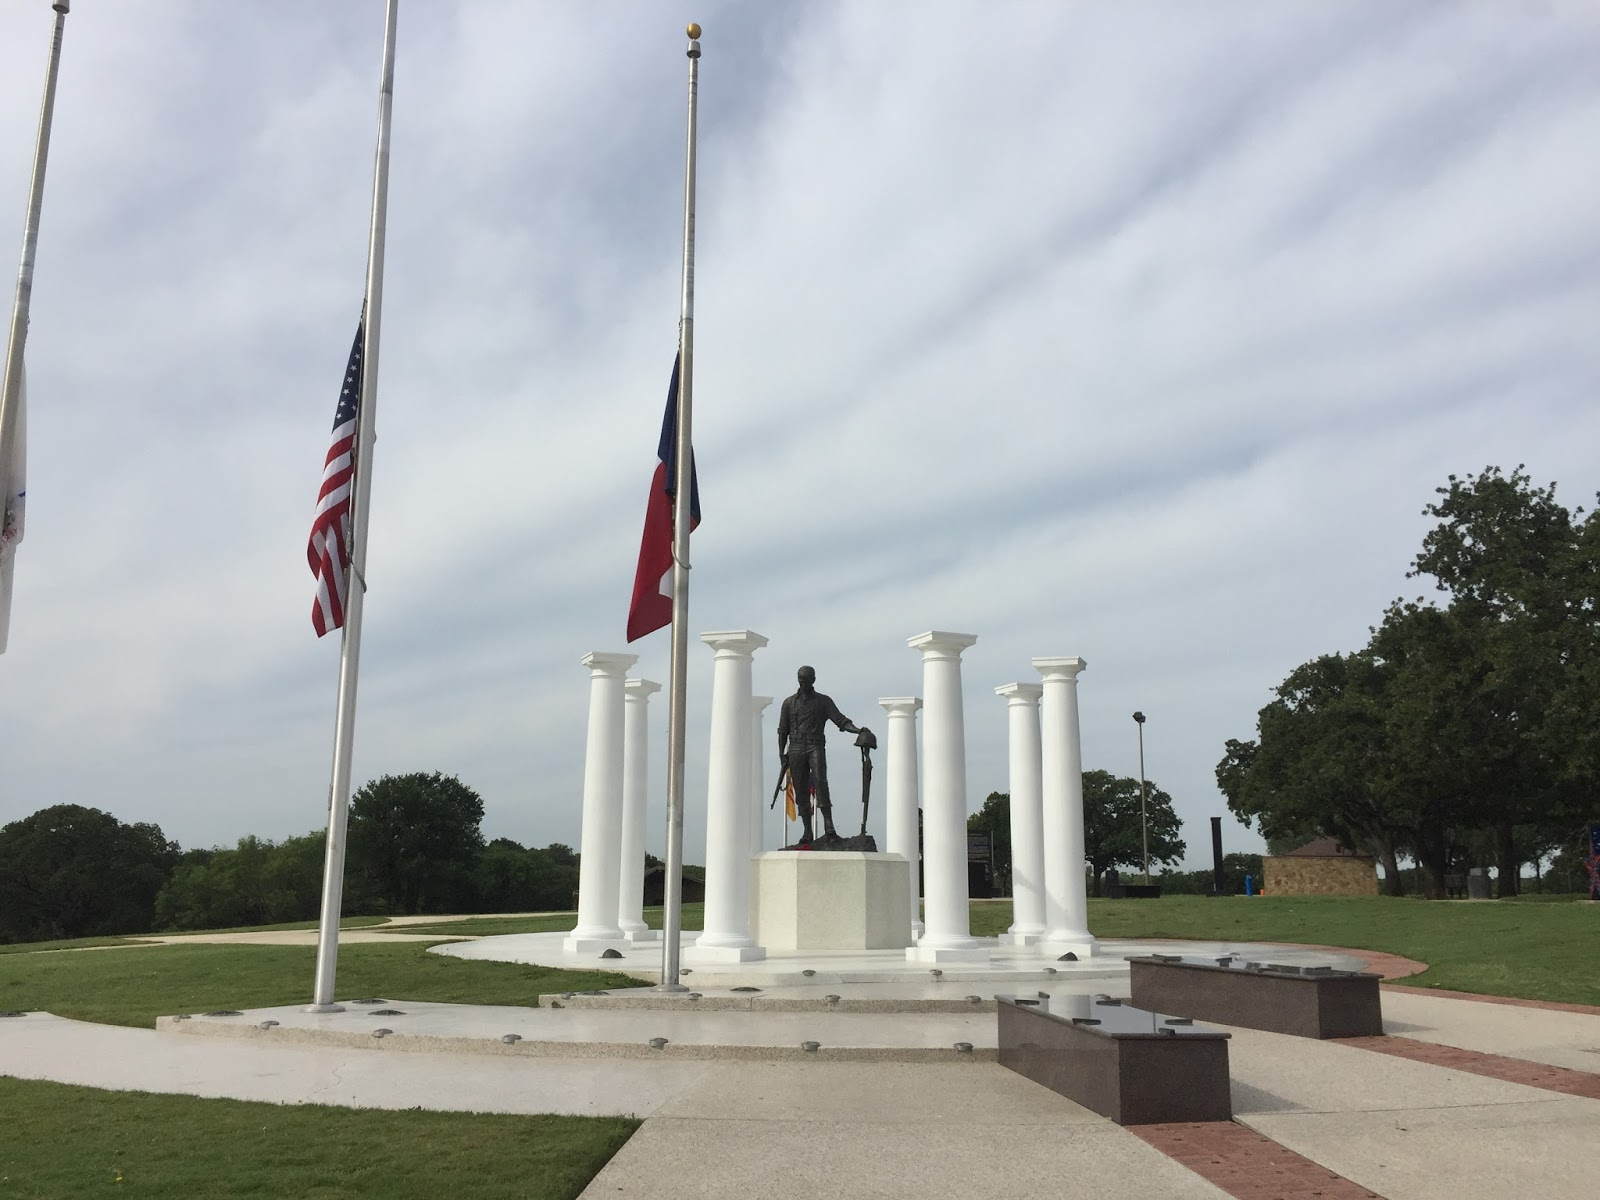 Tall Tales of a Family Veterans Park Arlington TX My